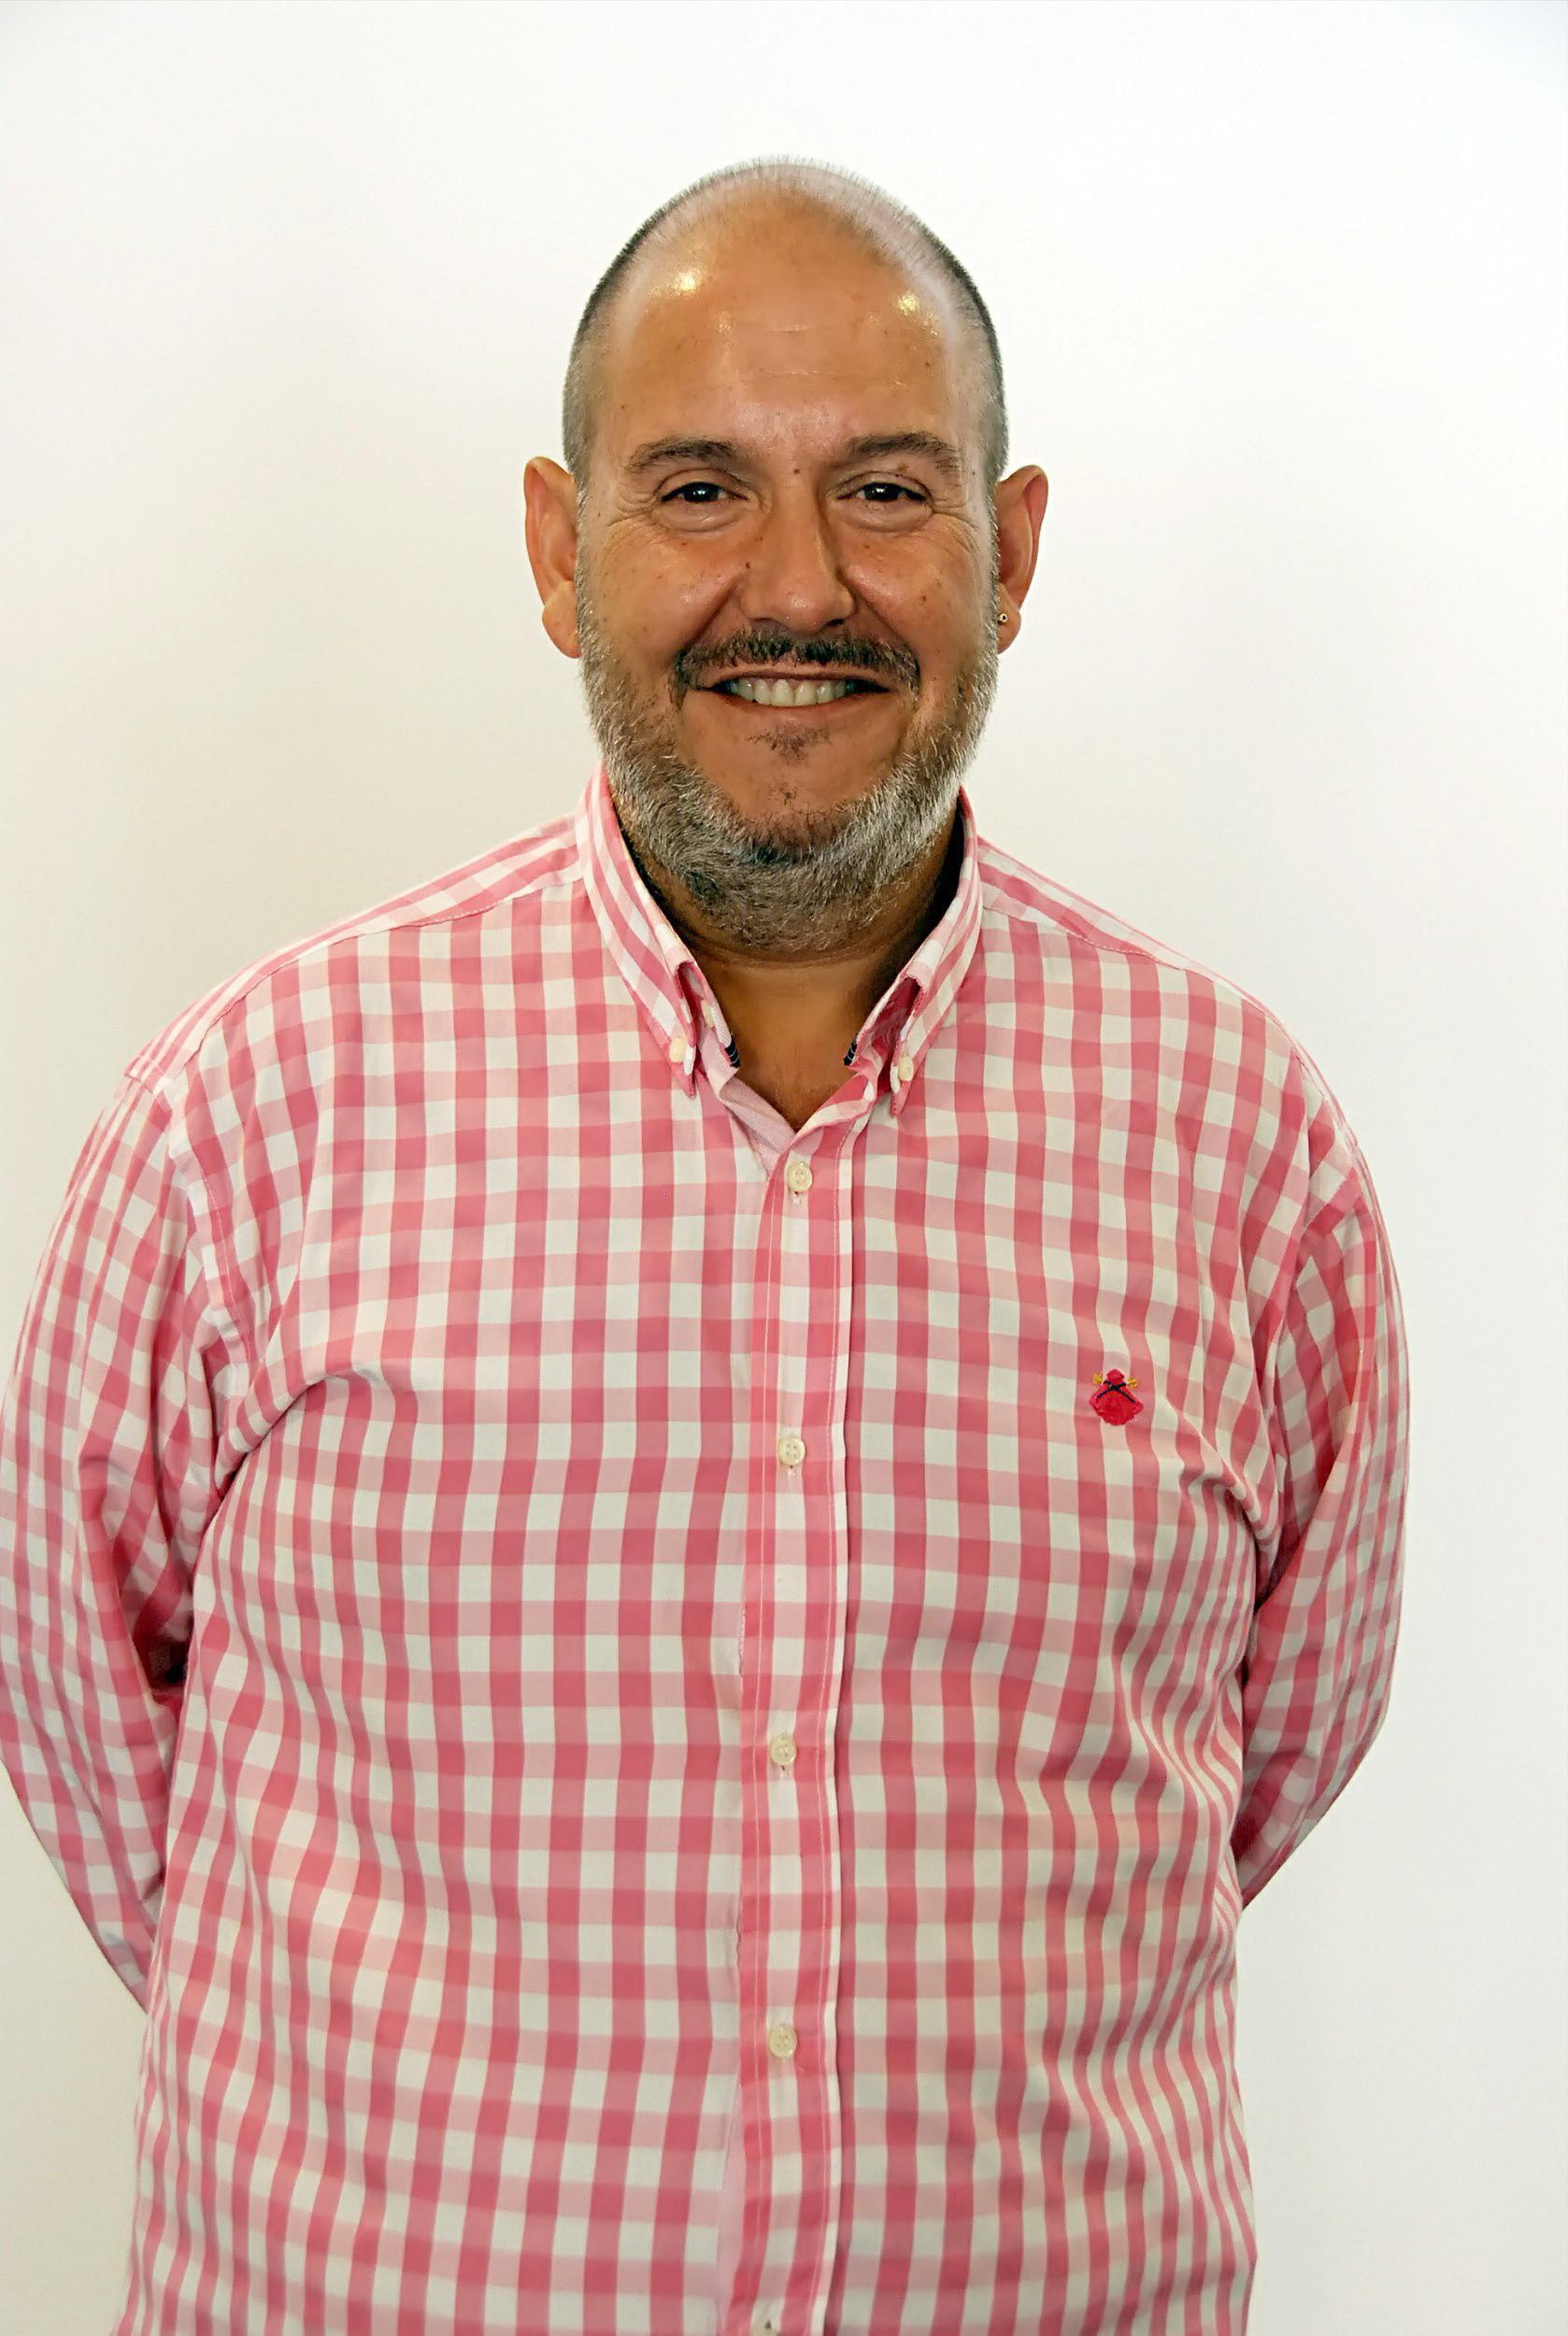 Ignacio Gutiérrez Sánchez